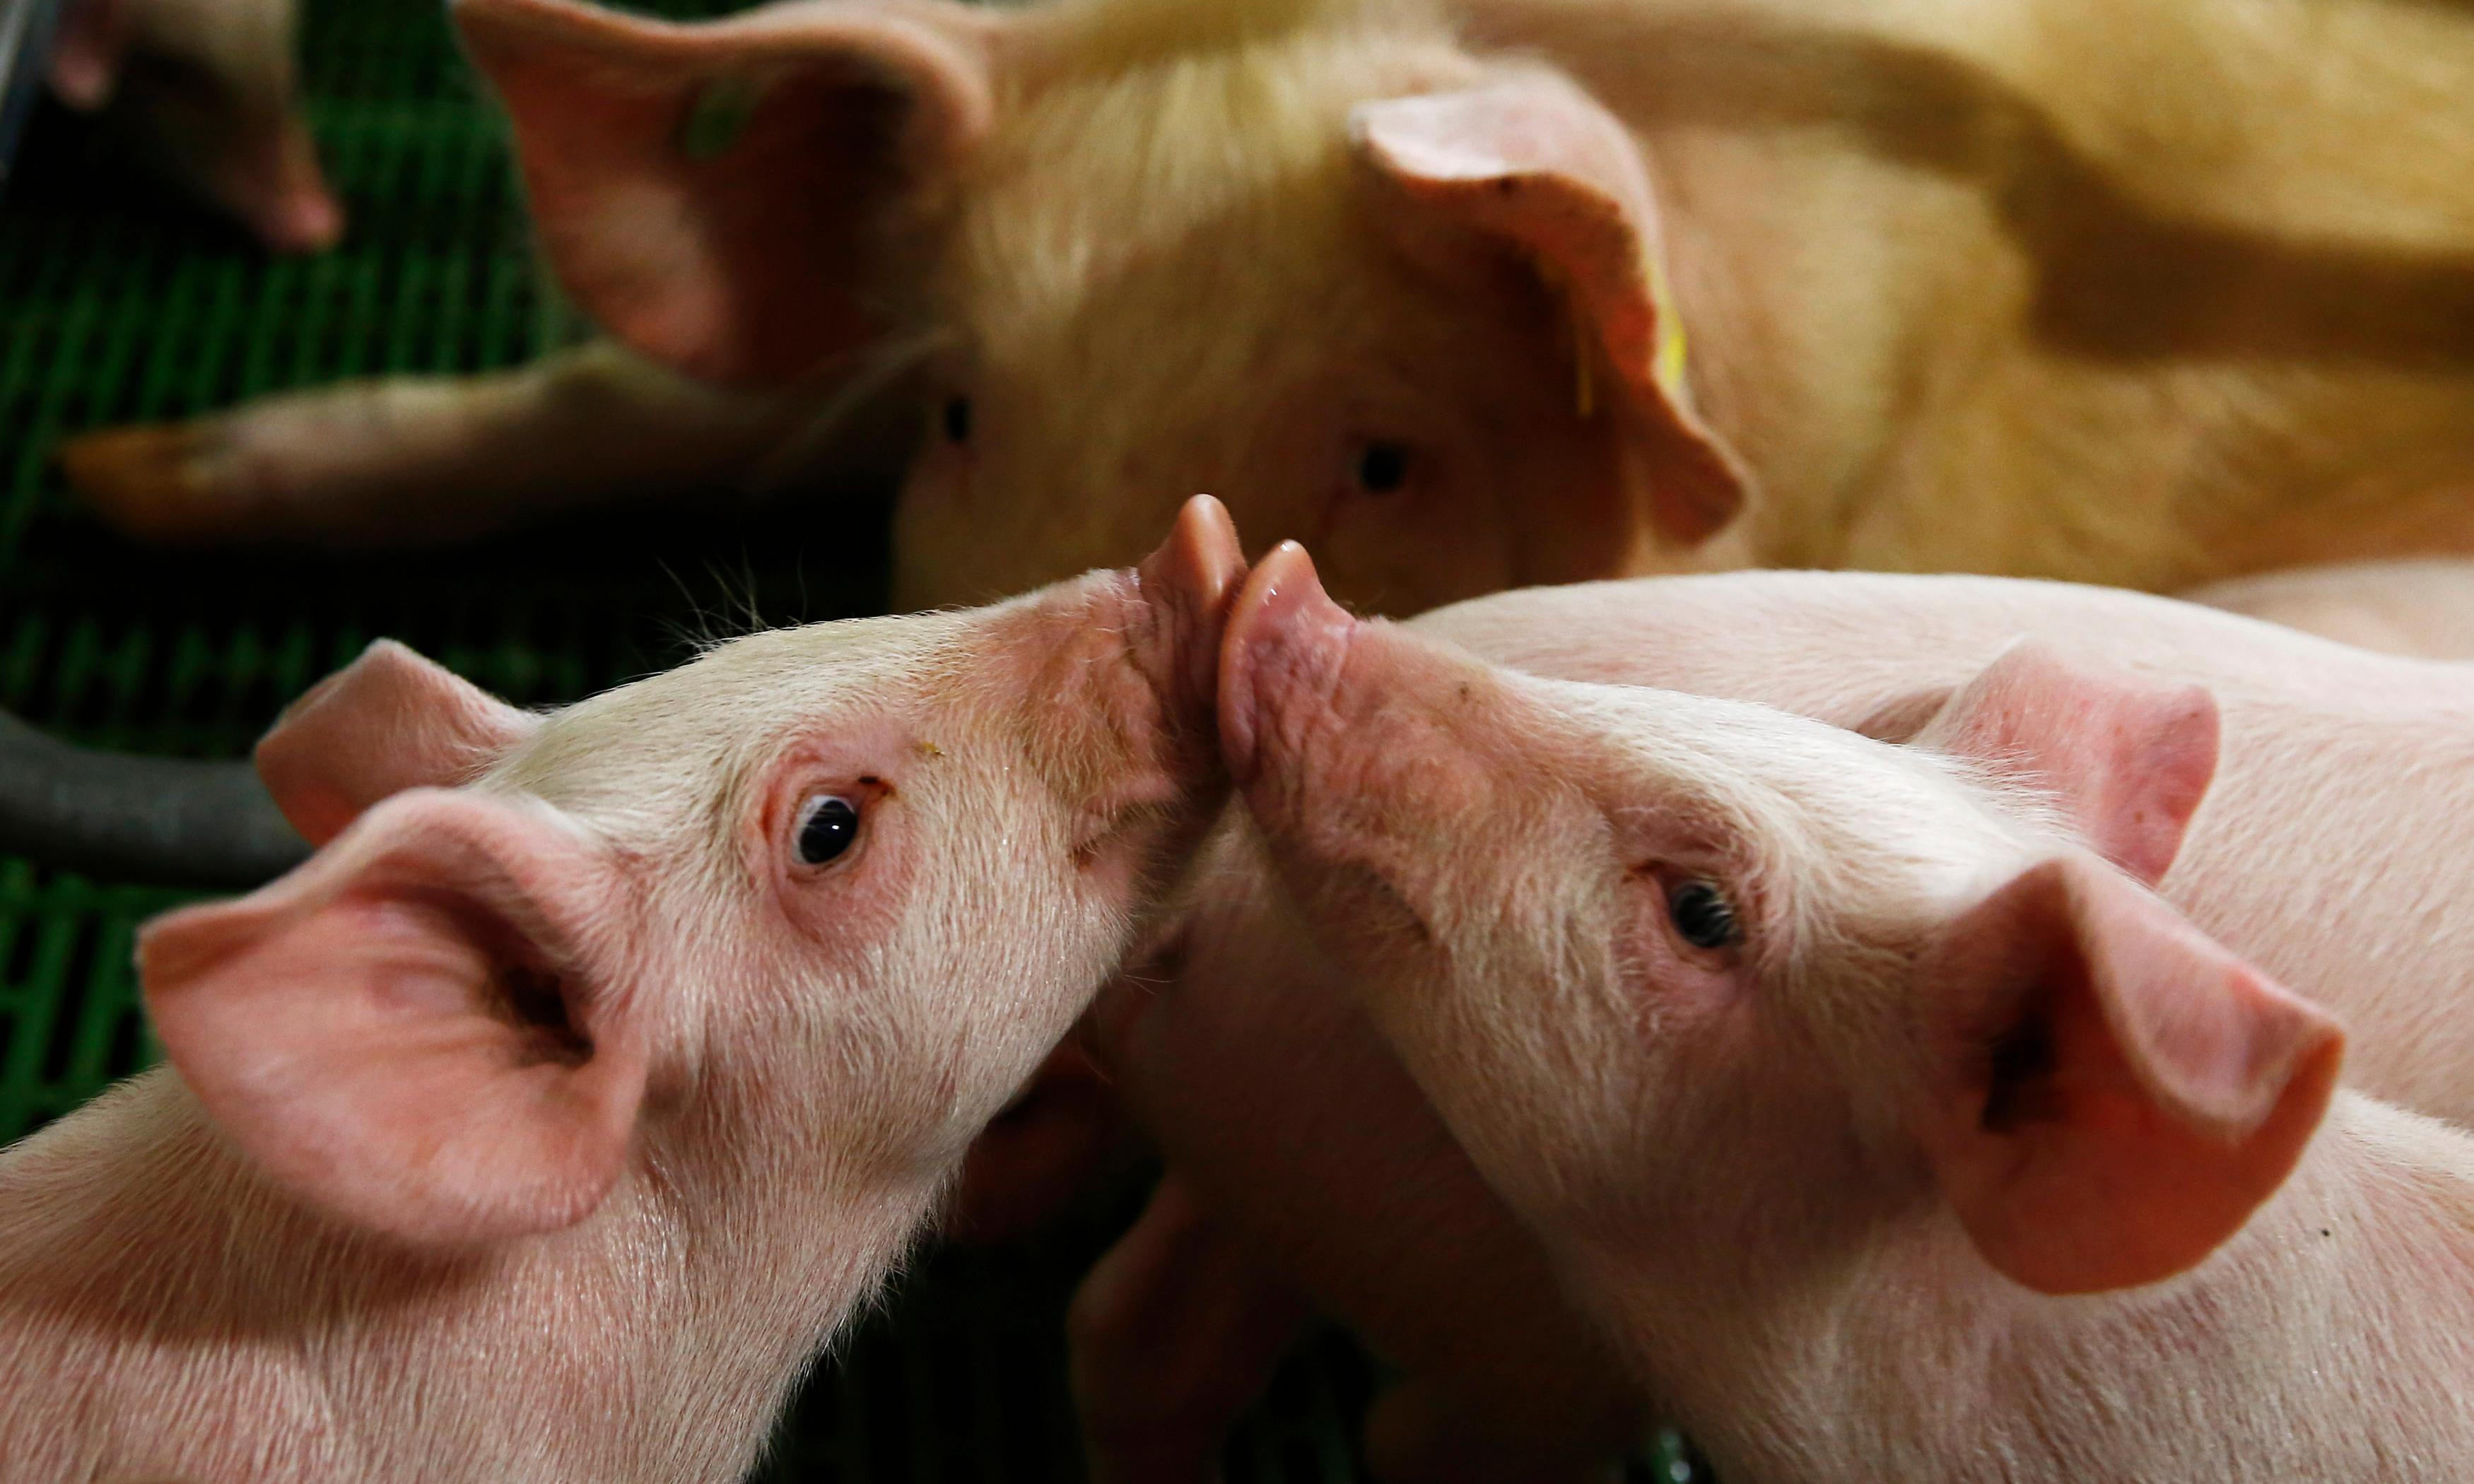 High risk of injuries in Denmark's live piglet export trade, audit warns